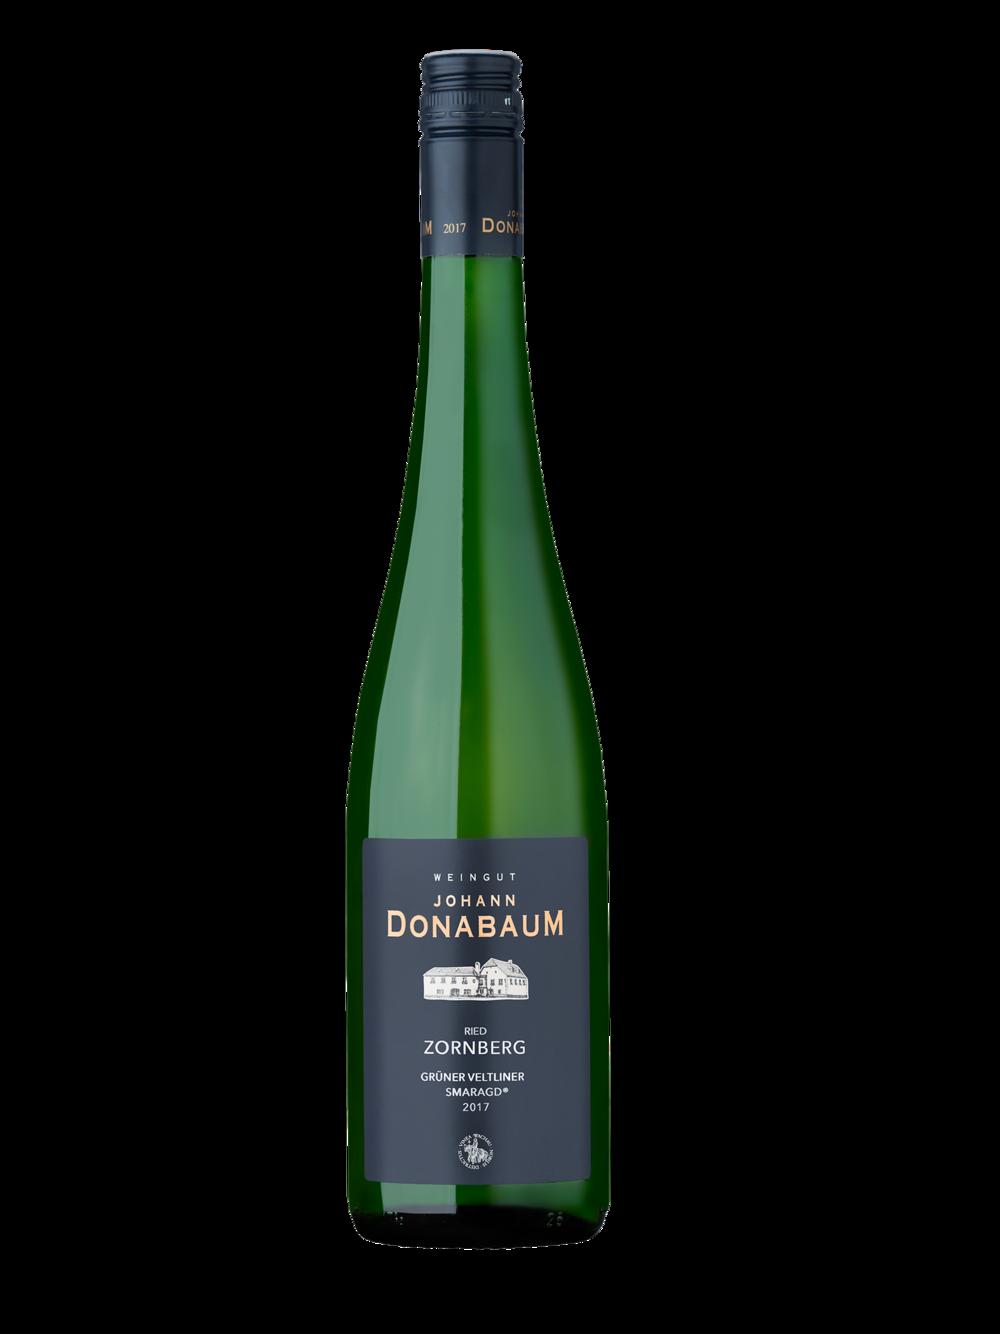 Weingut Johann Donabaum - Zornberg